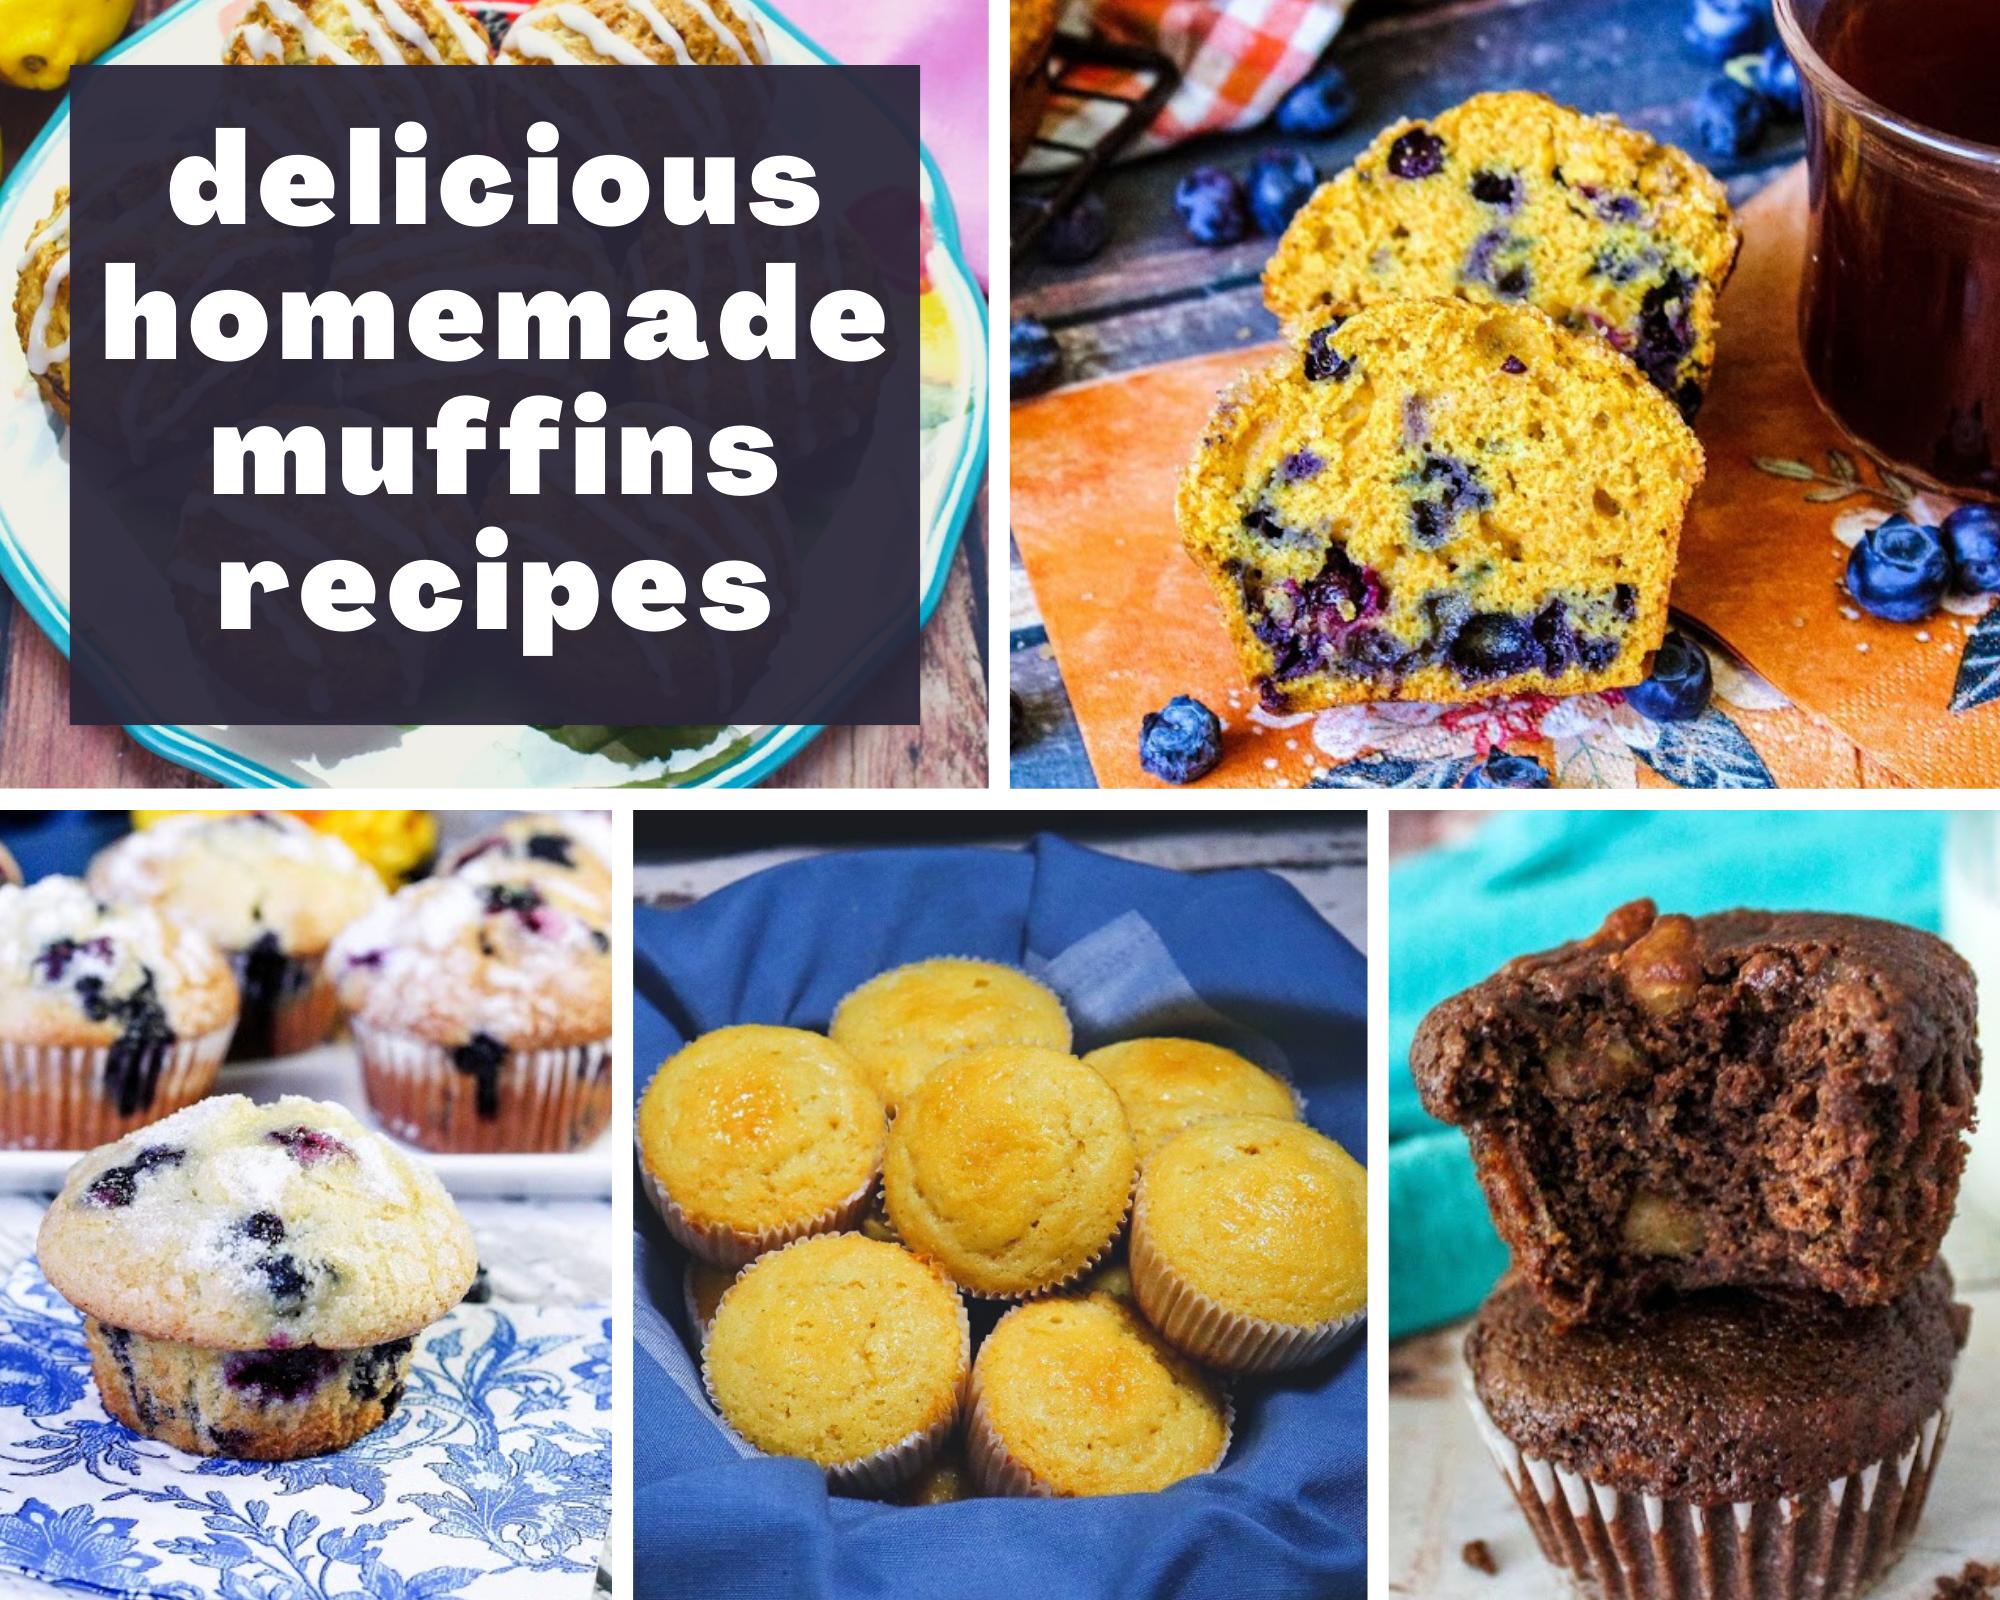 Homemade muffin recipes